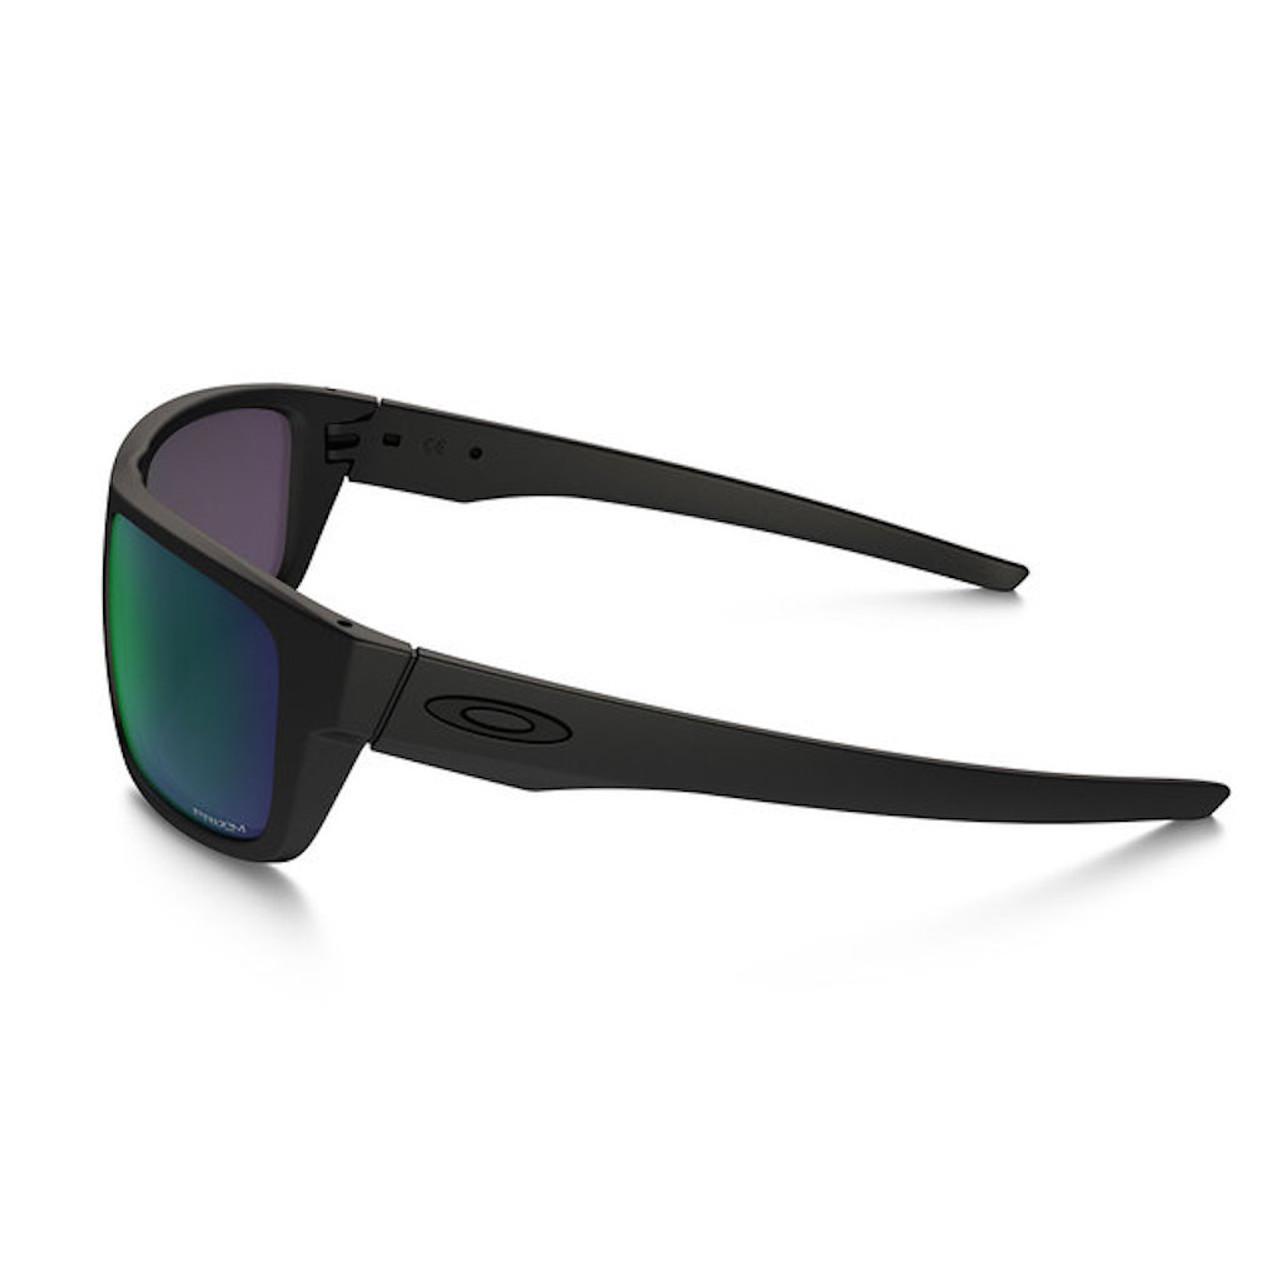 e4dc548c1f5 ... Oakley Men s SI Drop Point Matte Black Frame Prizm Maritime Polarized  Lenses